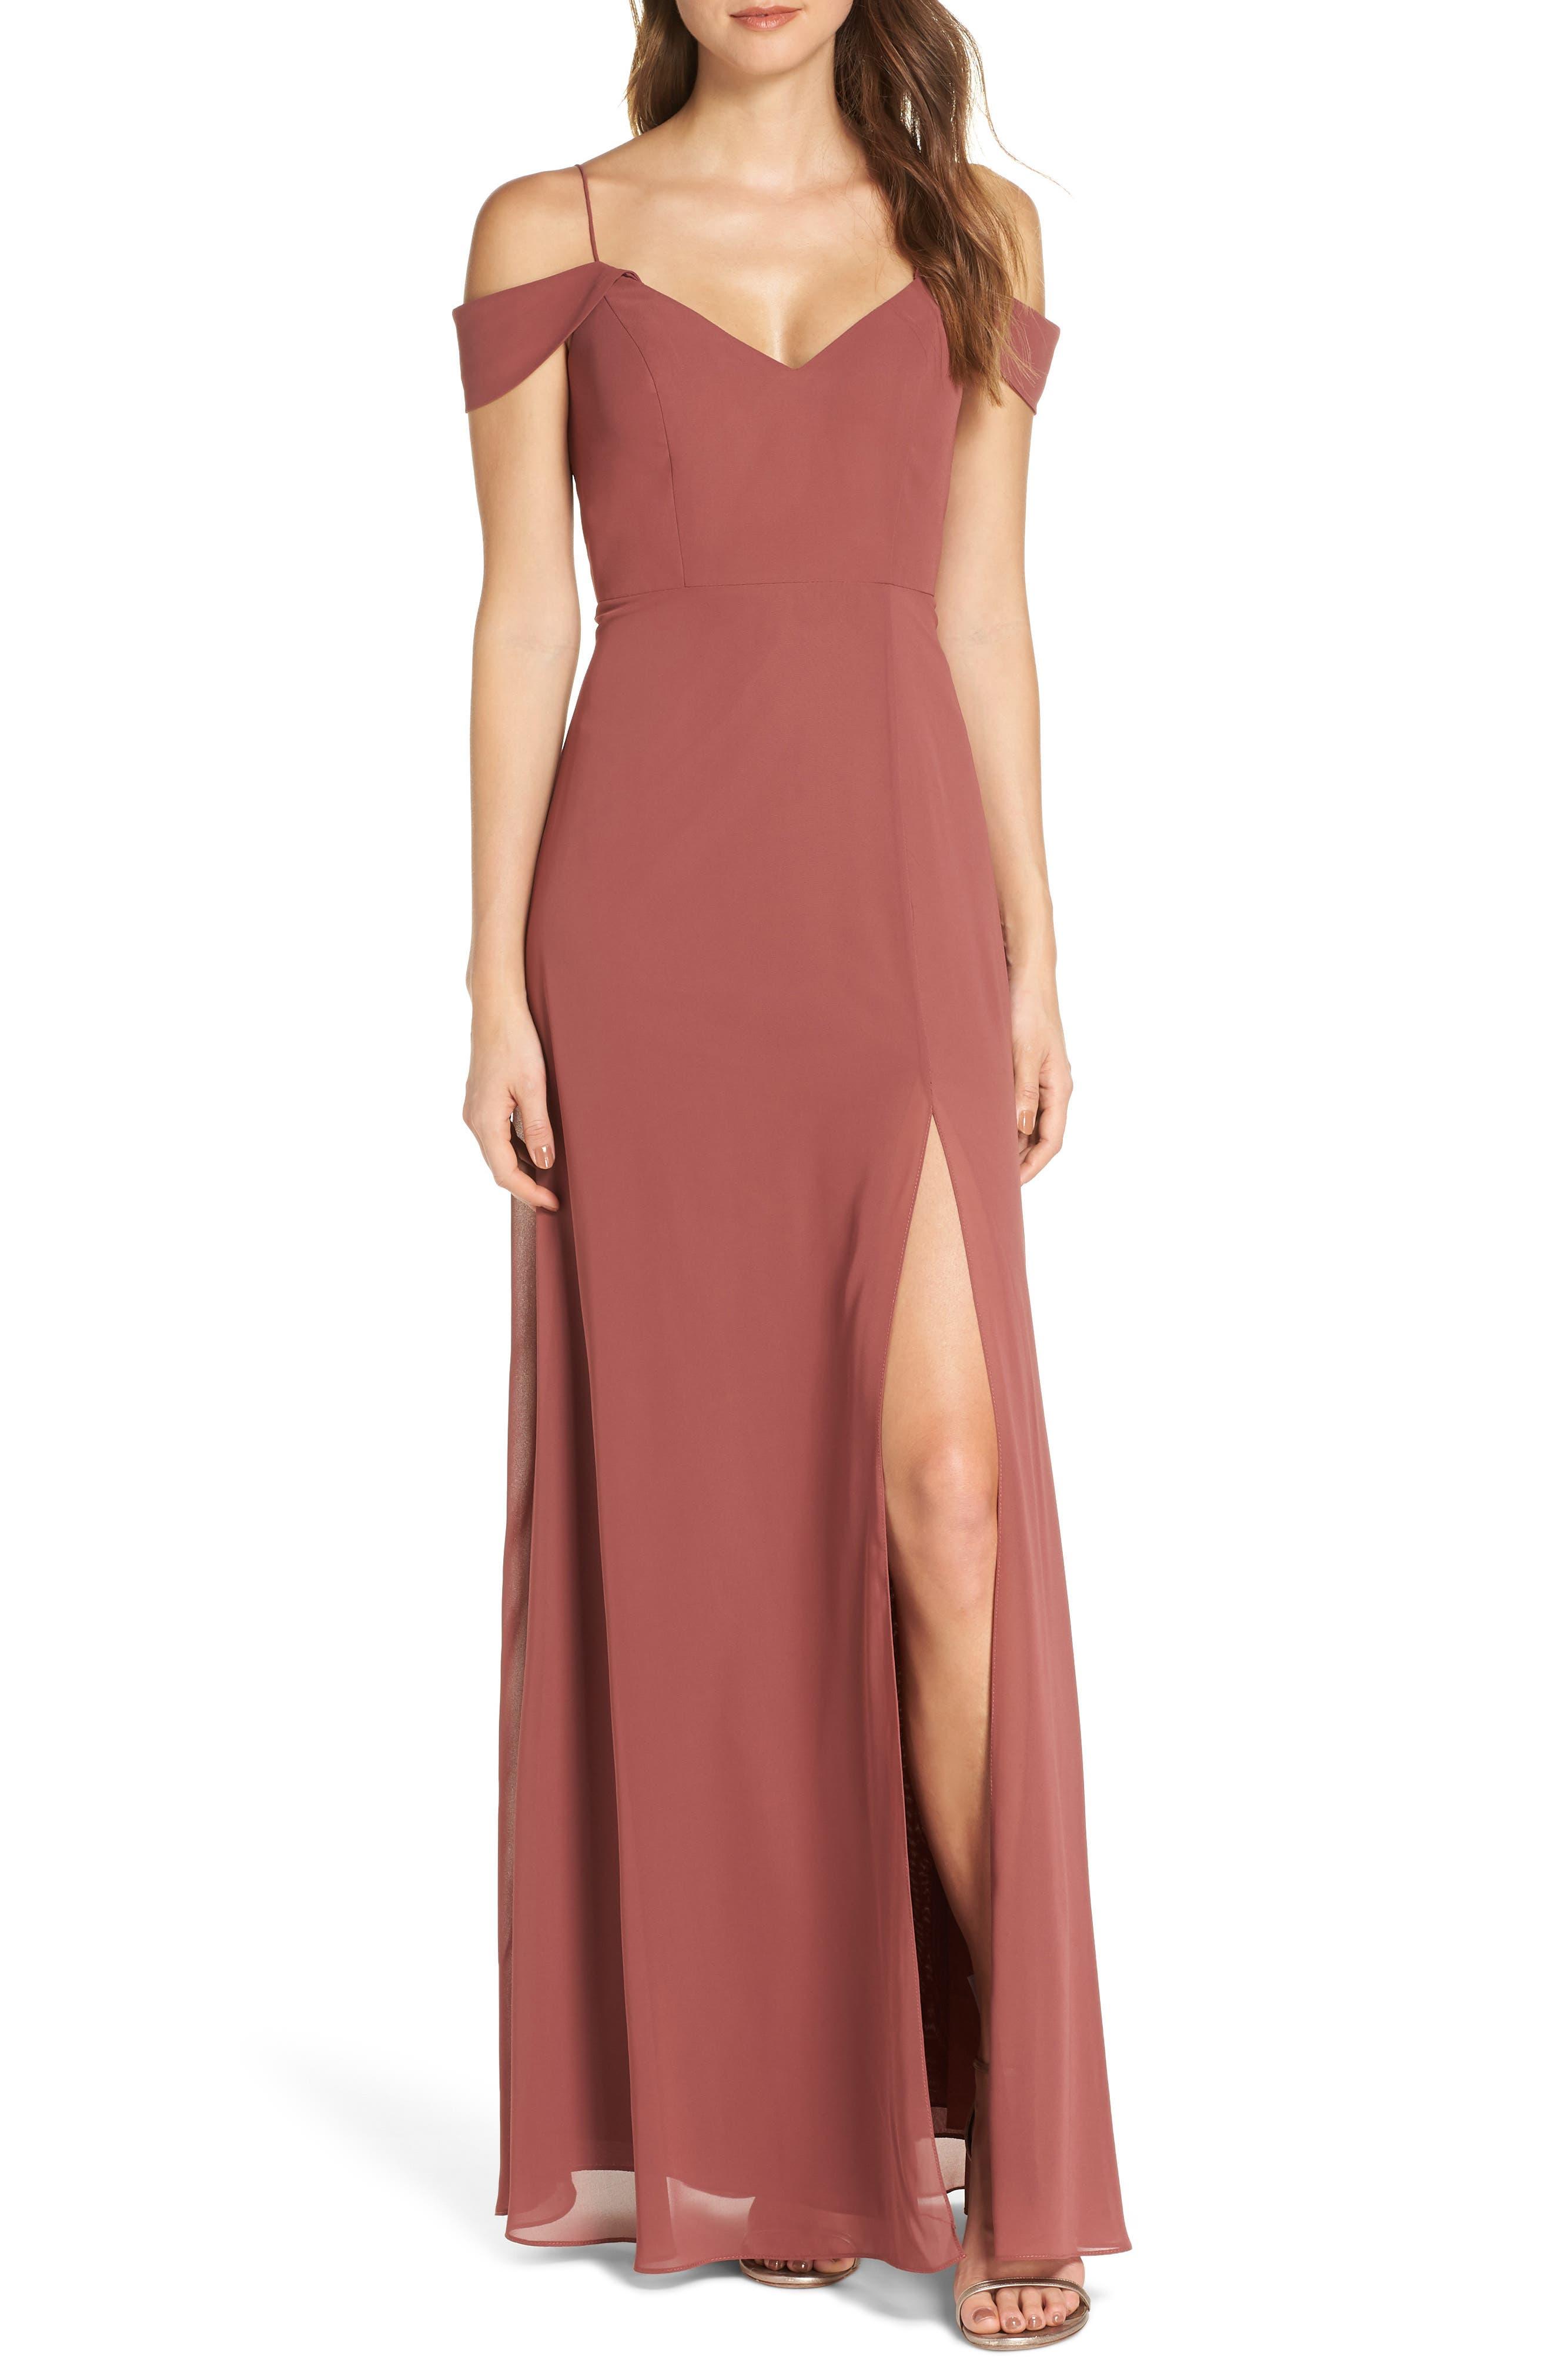 Jenny Yoo Priya Cold Shoulder Chiffon Evening Dress, Red